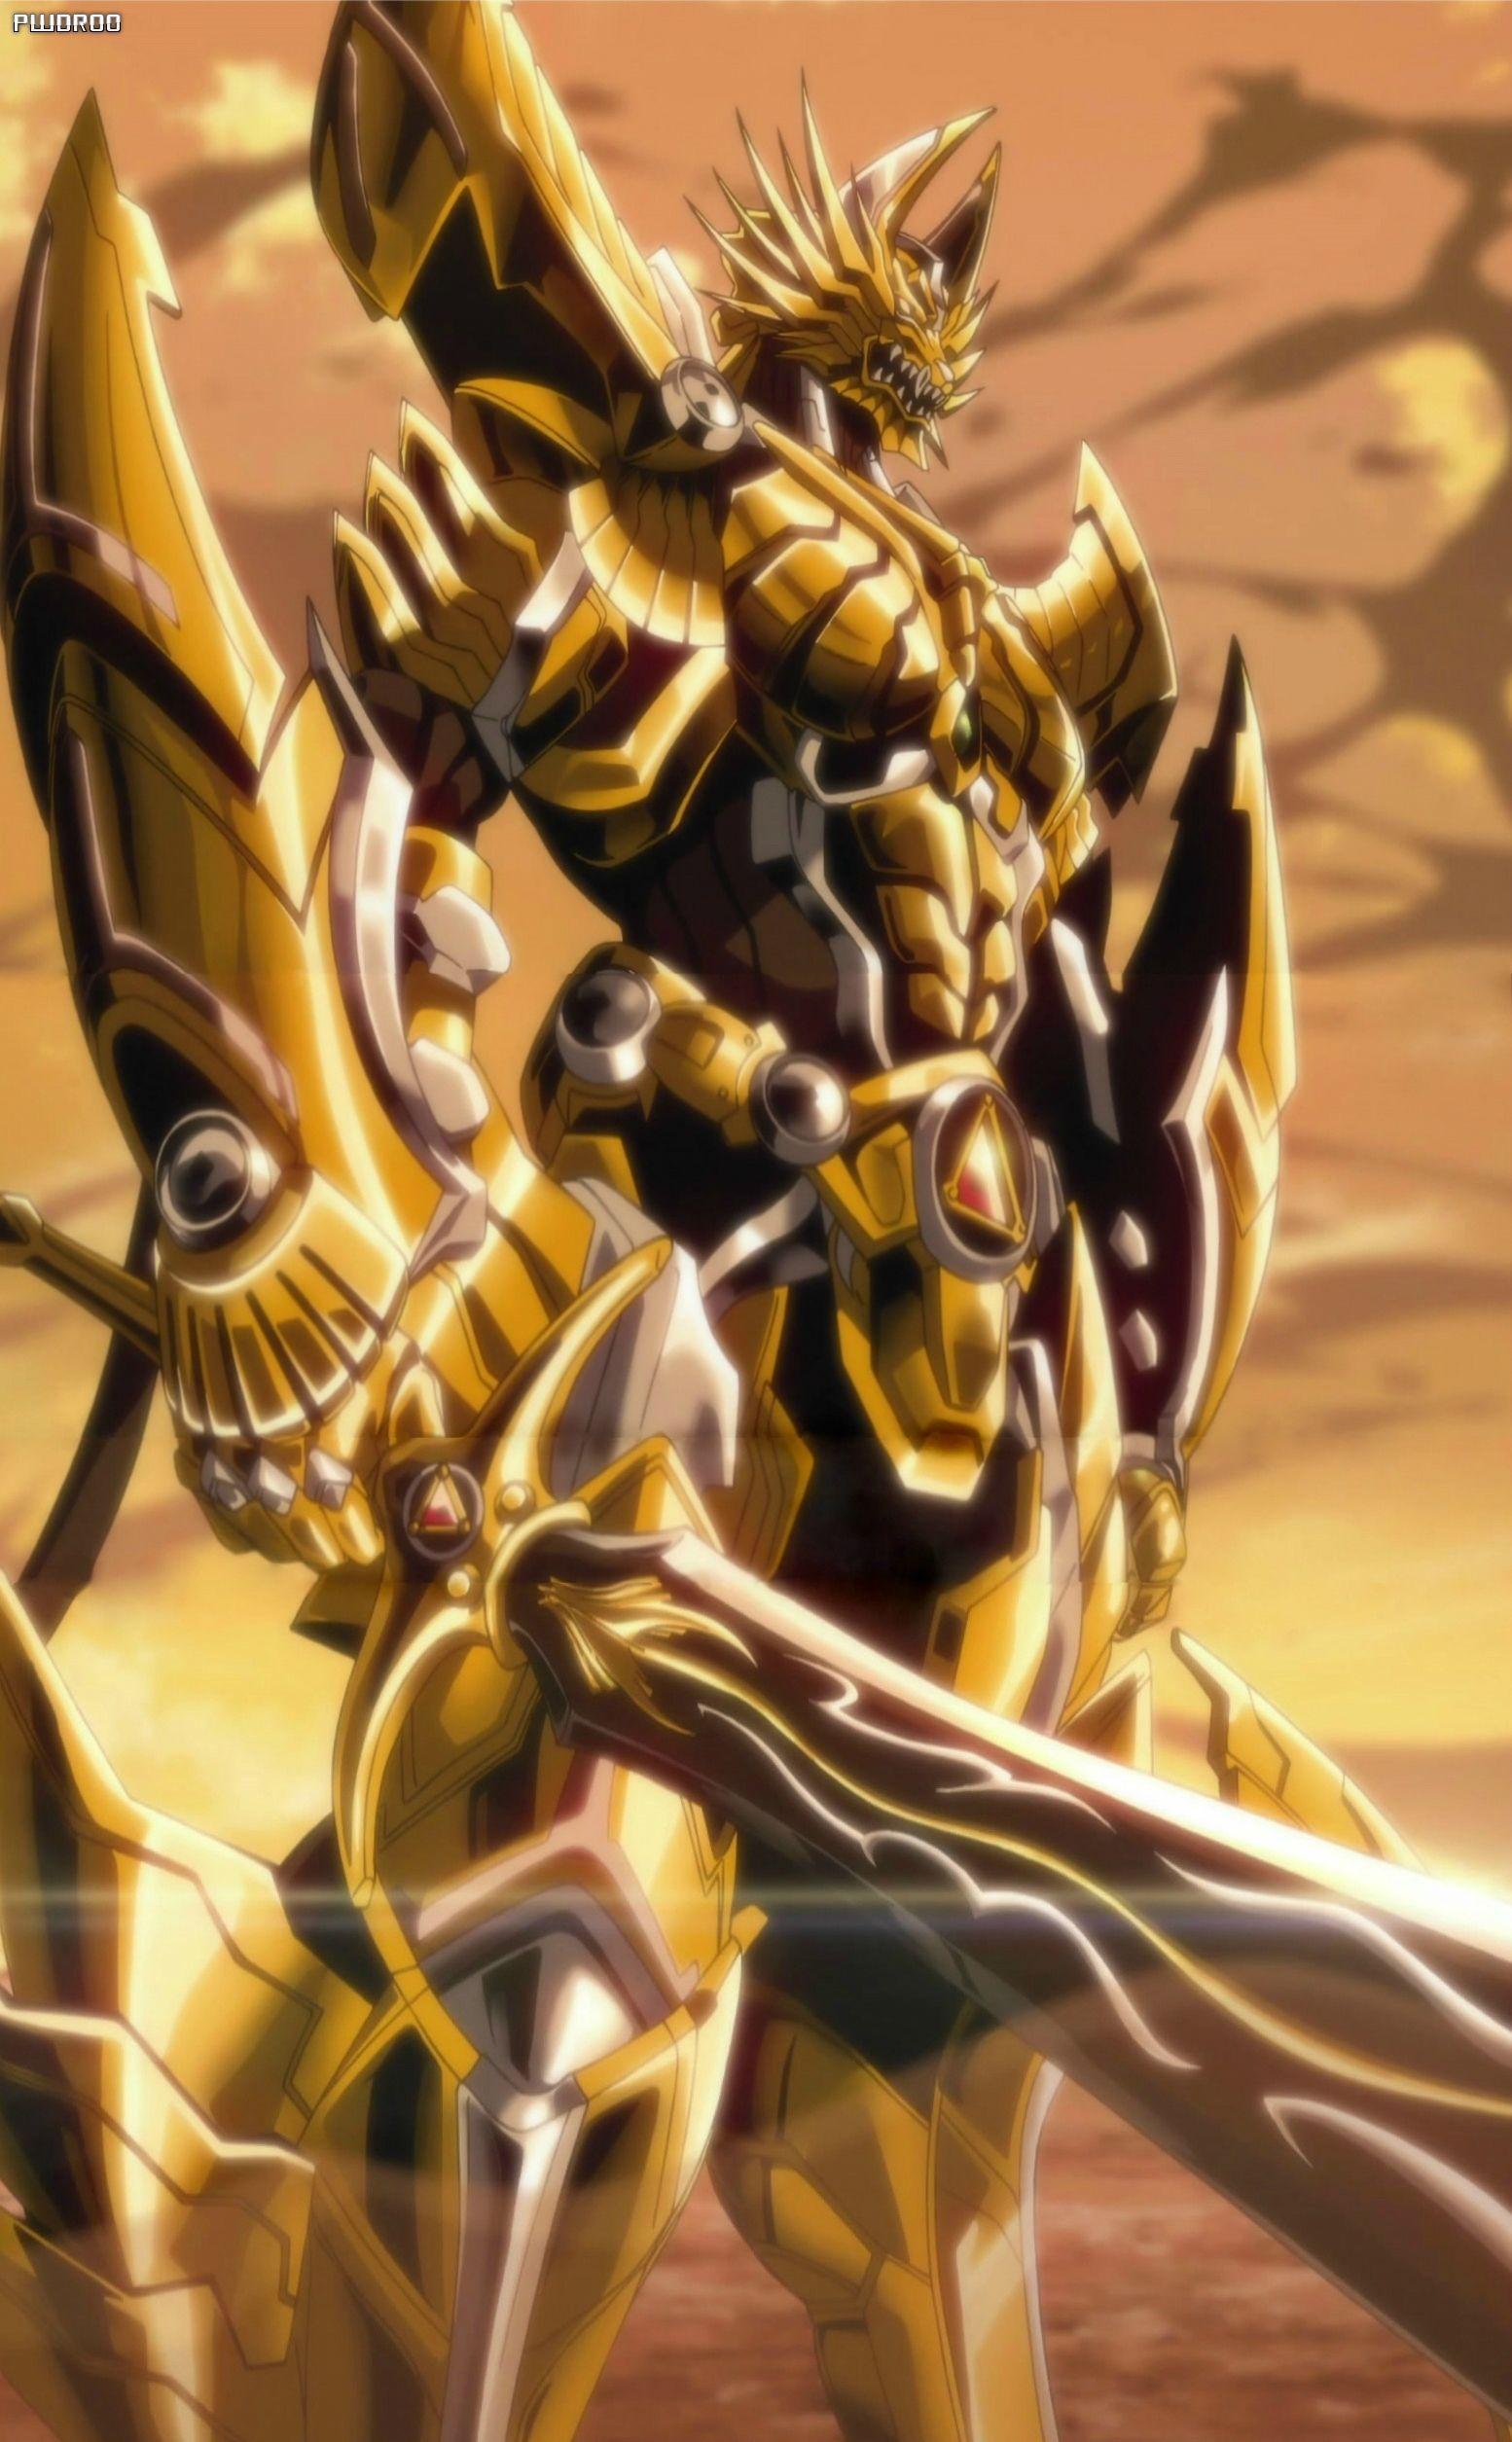 Anime Golden Dragon Armor Fantasy Armor Dragon Armor Dragon Artwork Fantasy Black and gold dragon helmet by azmal.deviantart.com on, heres the helmet to go with the armor. anime golden dragon armor fantasy